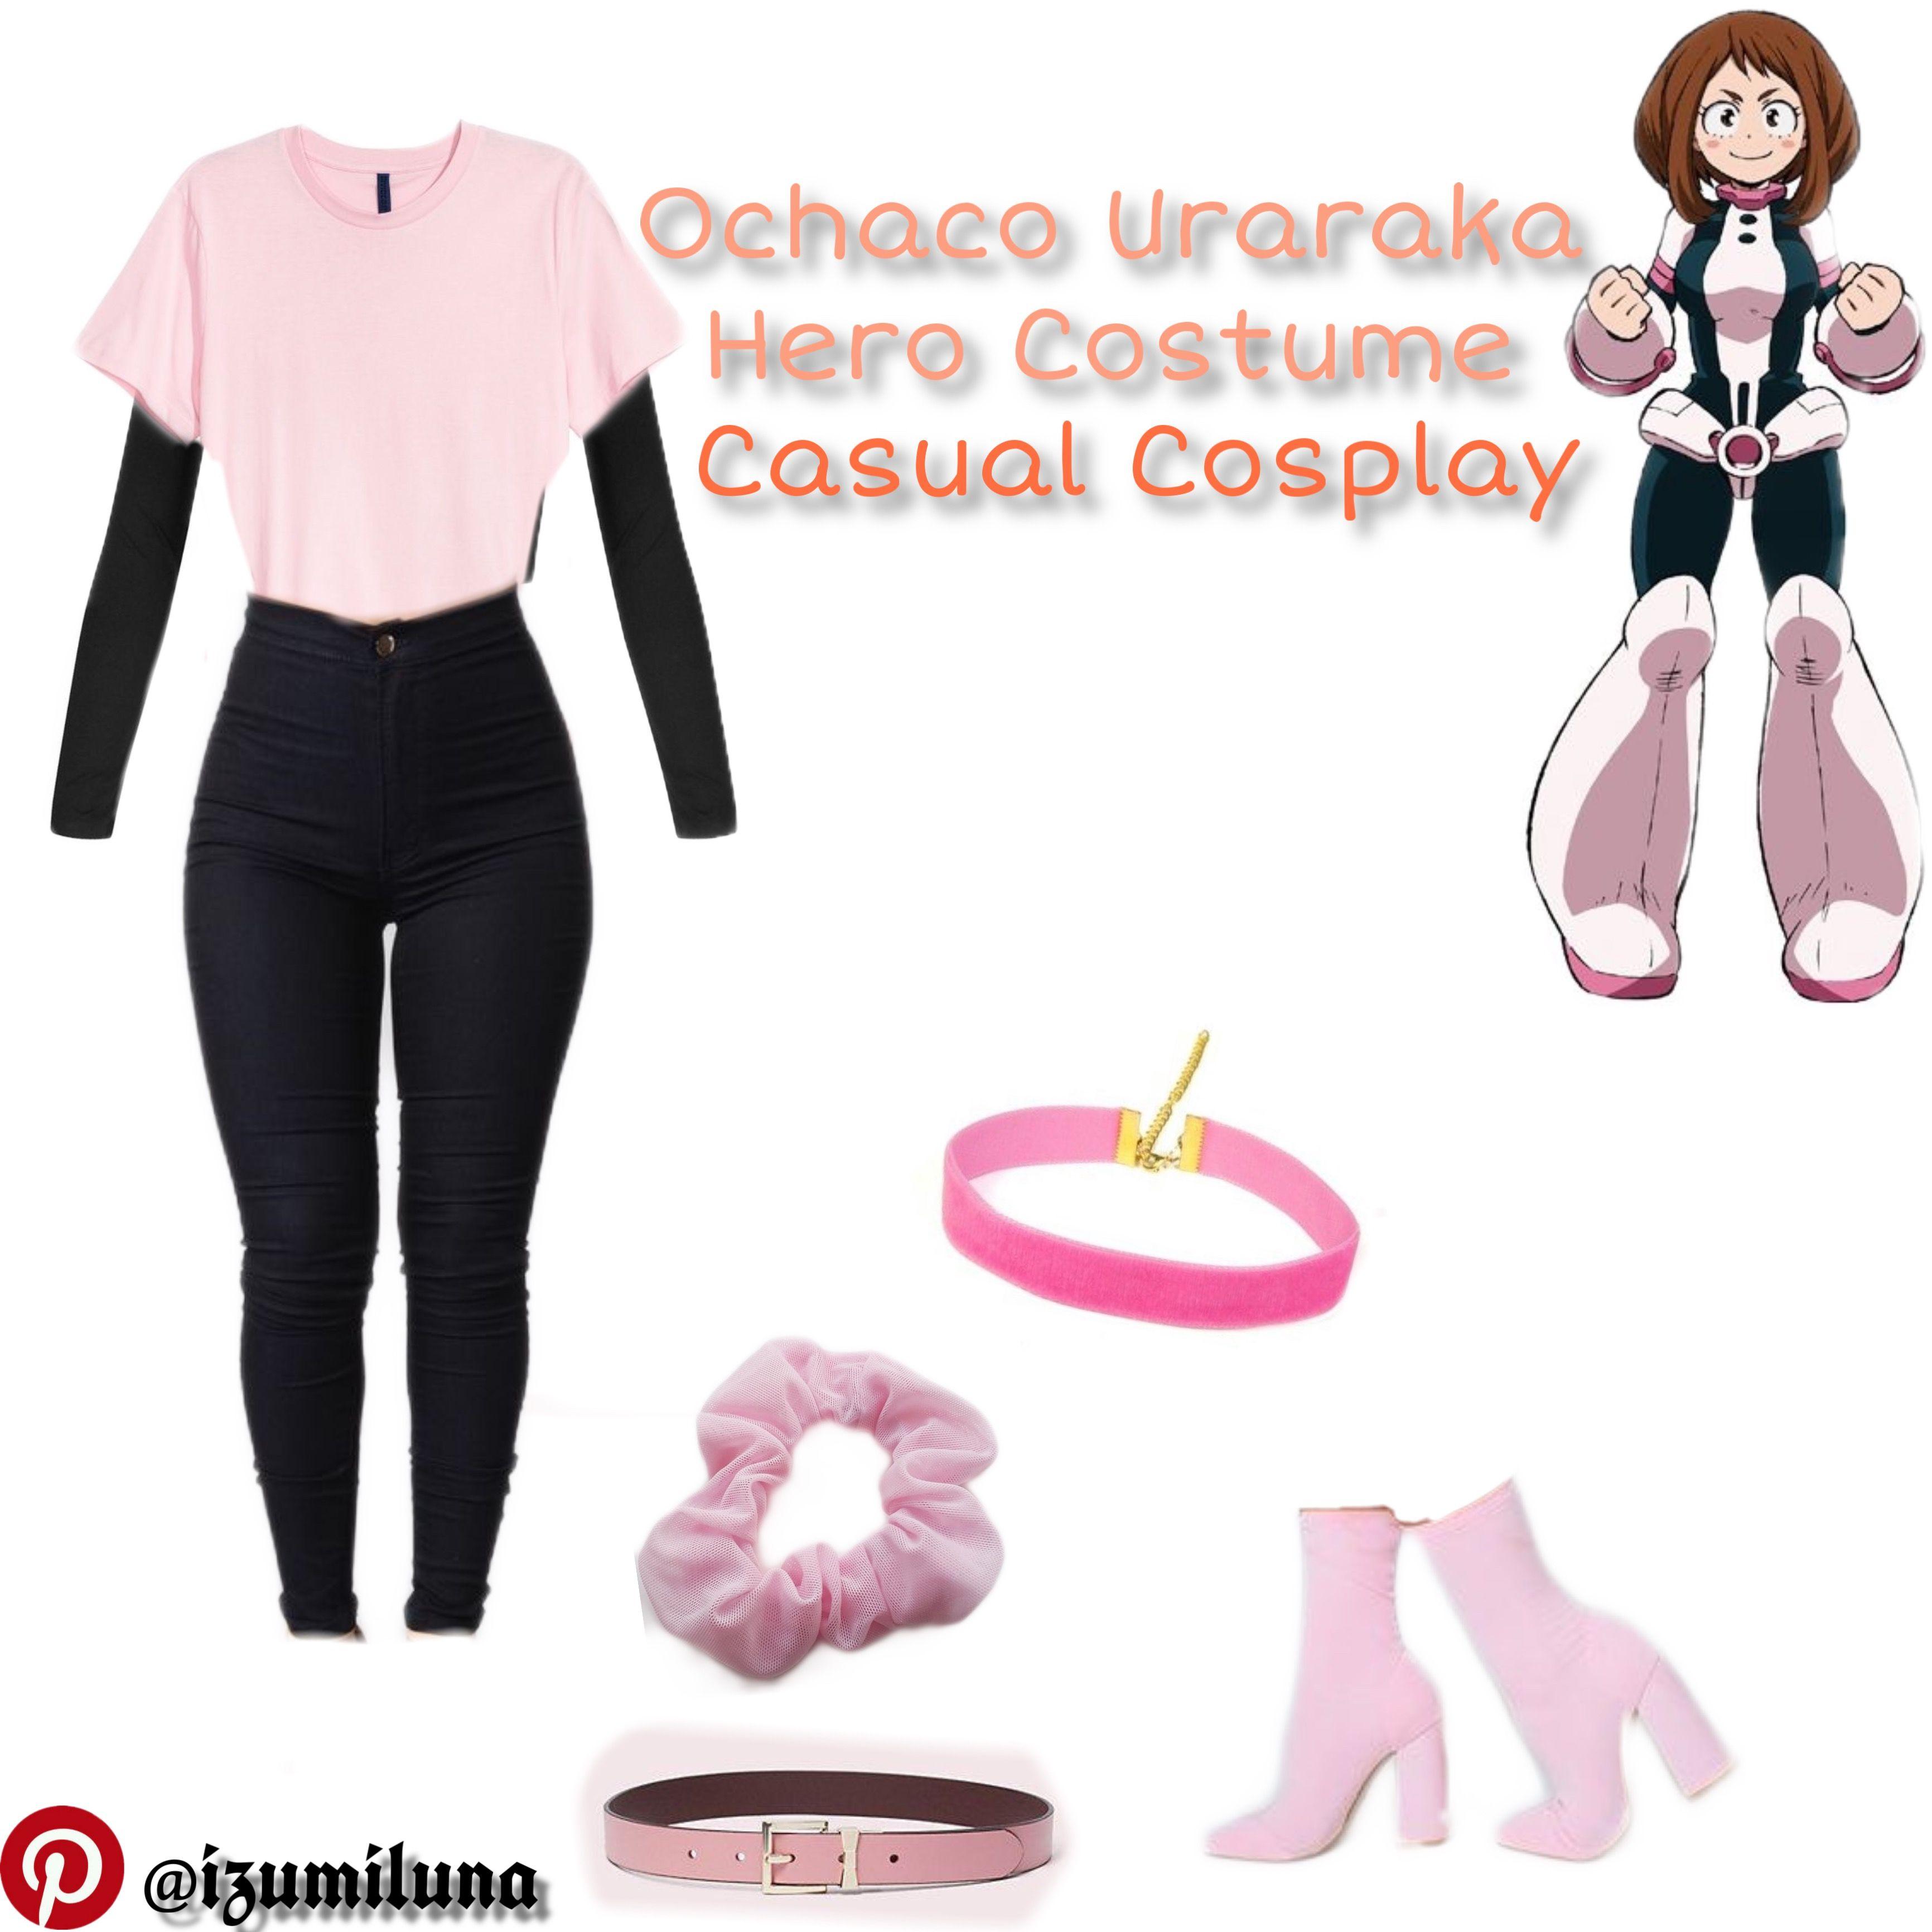 Ochaco uraraka hero costume casual cosplay casual